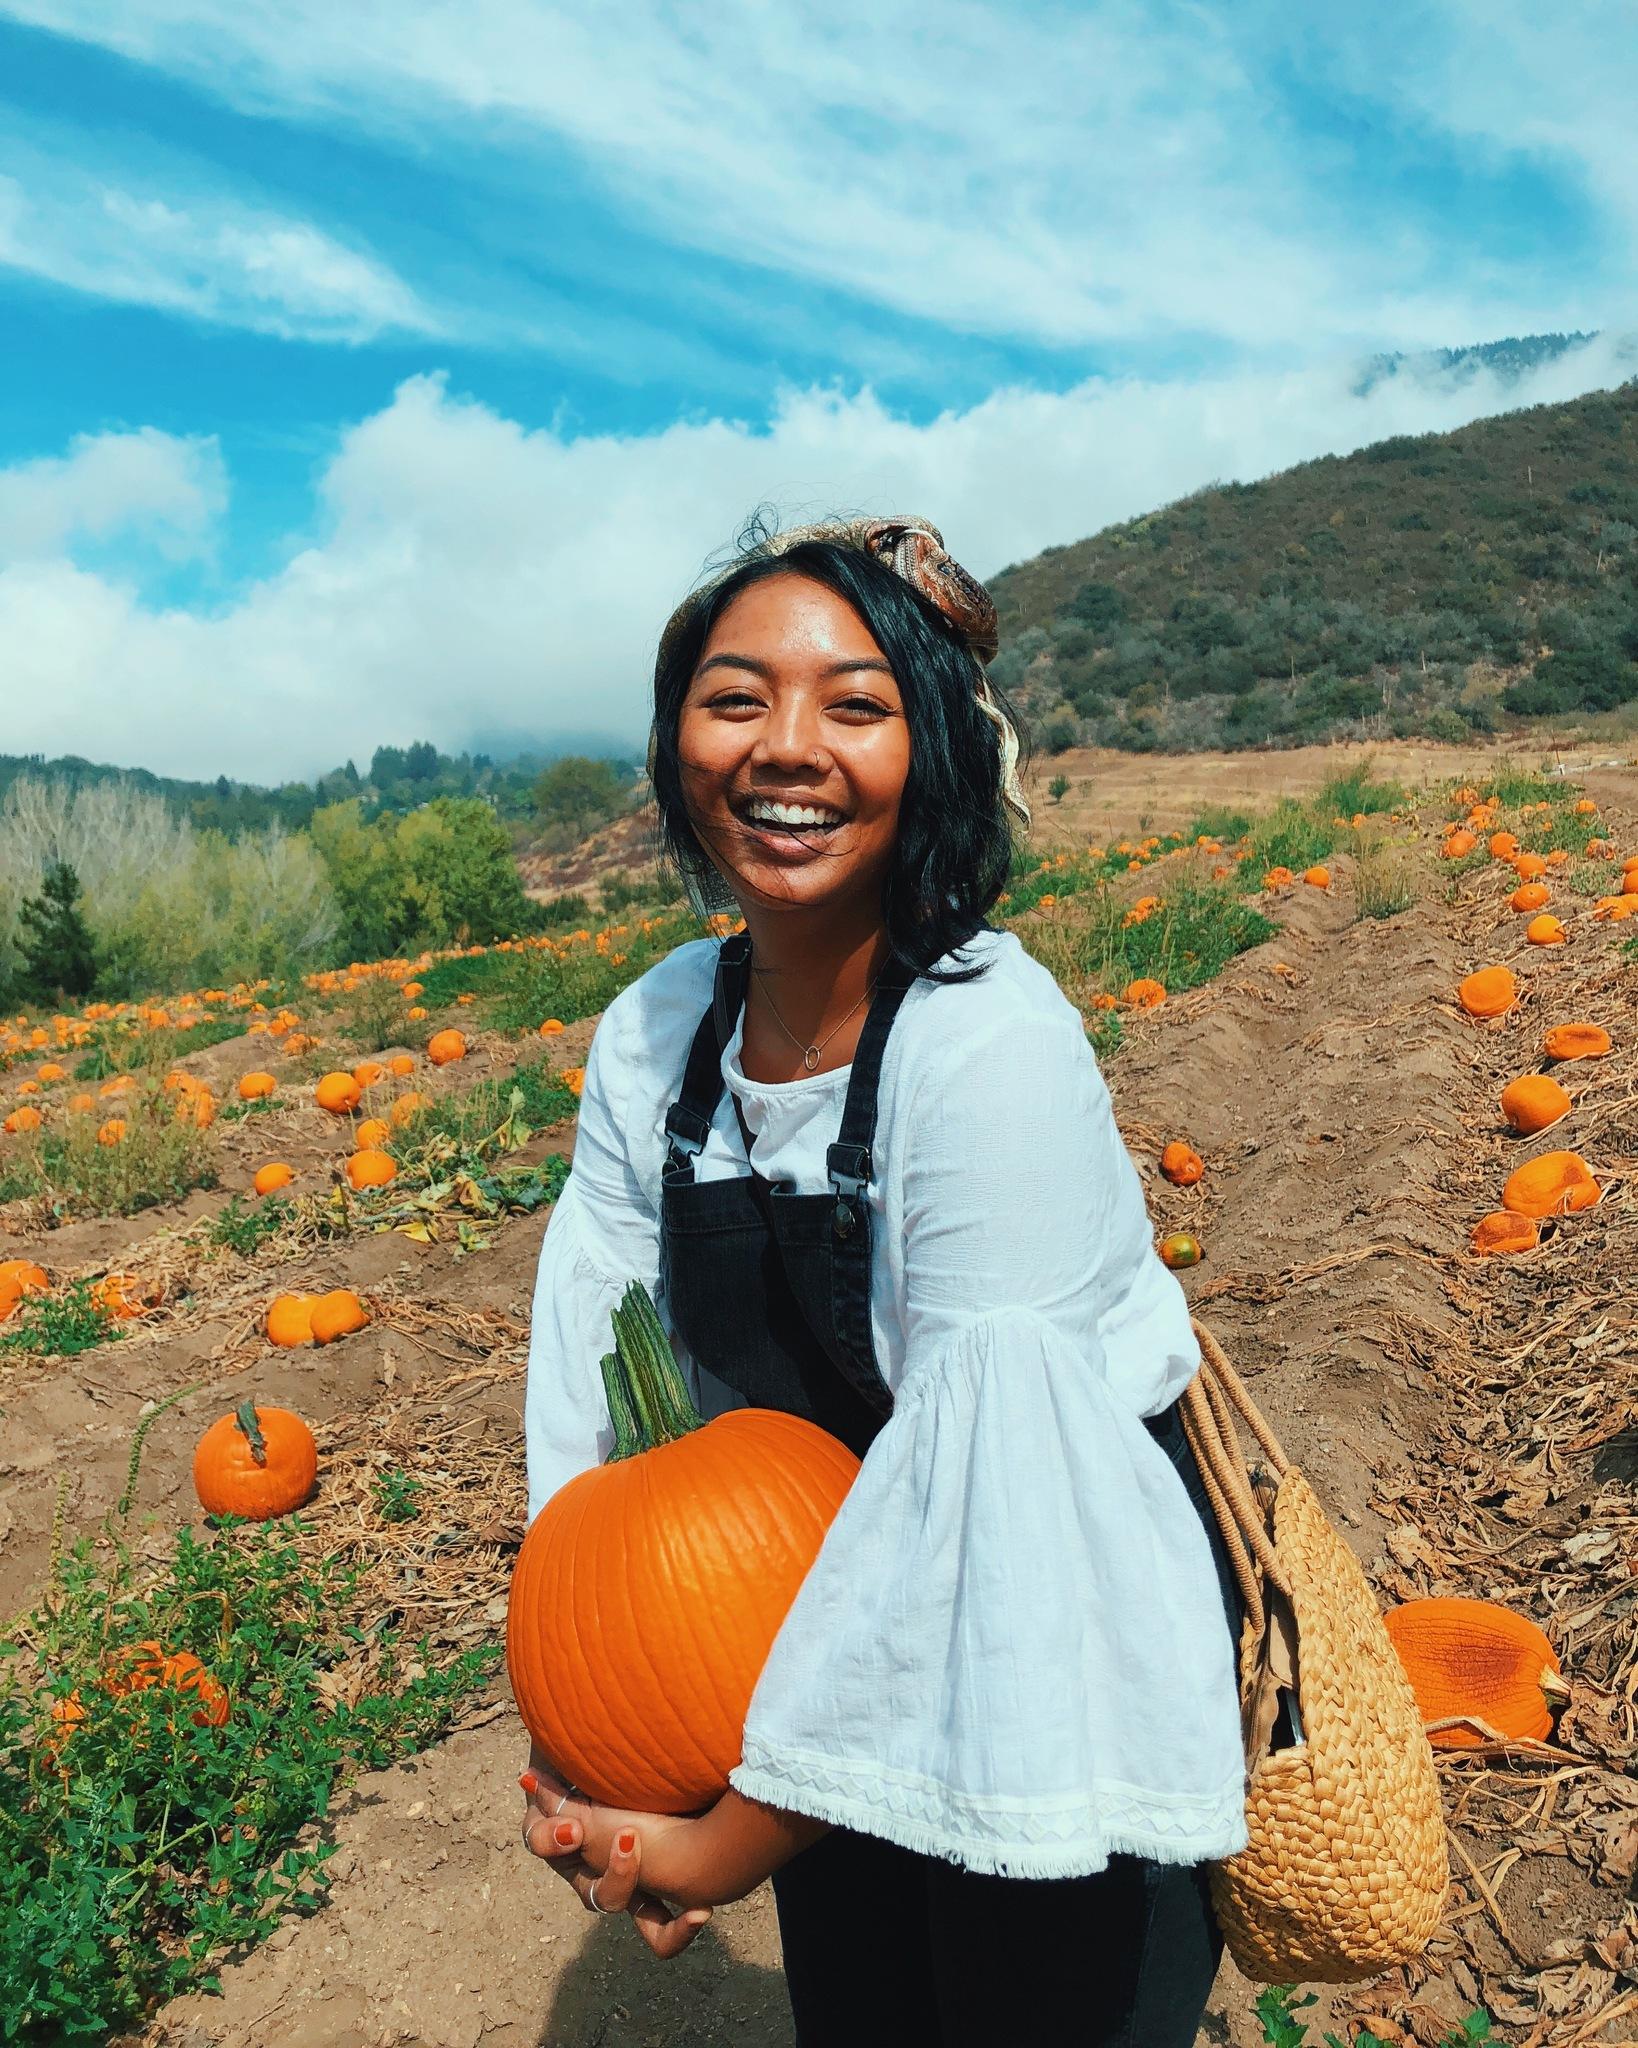 Photo of Aubrey holding a pumpkin at Riley's Apple Farm